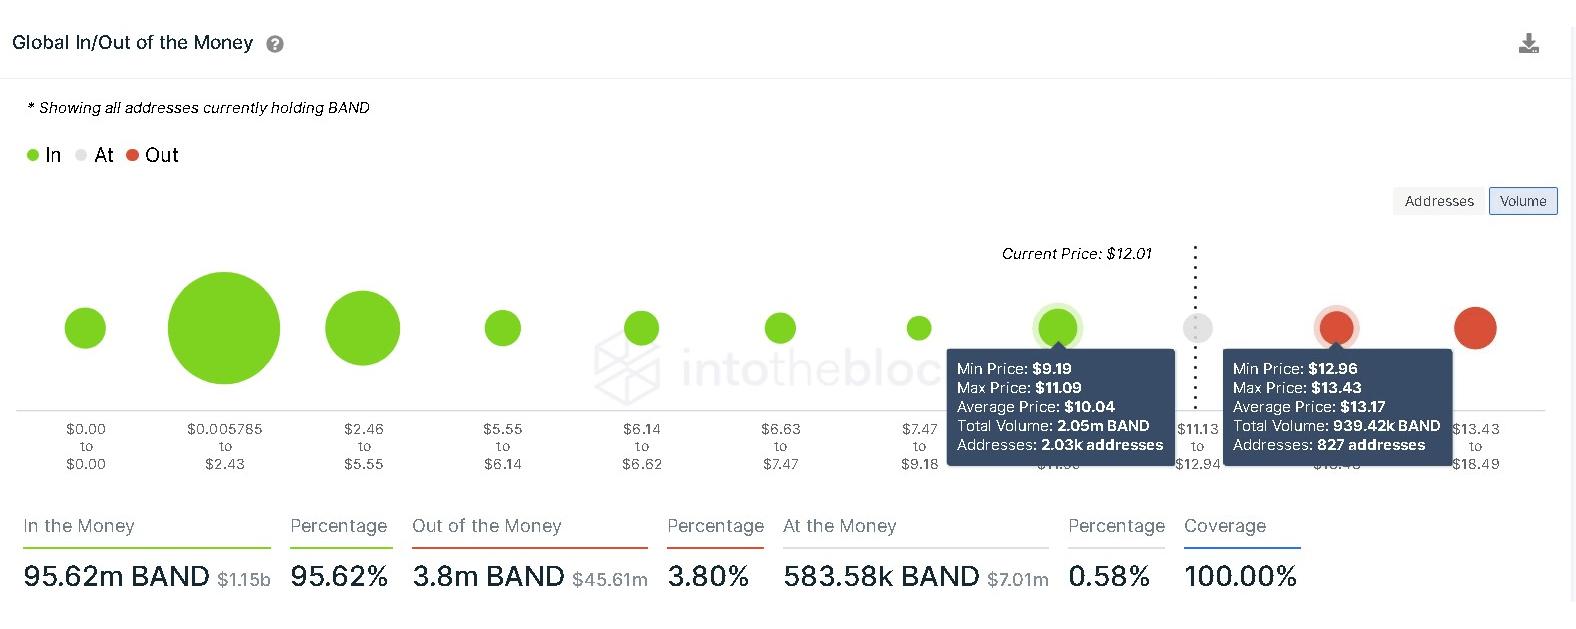 BAND GIOM chart